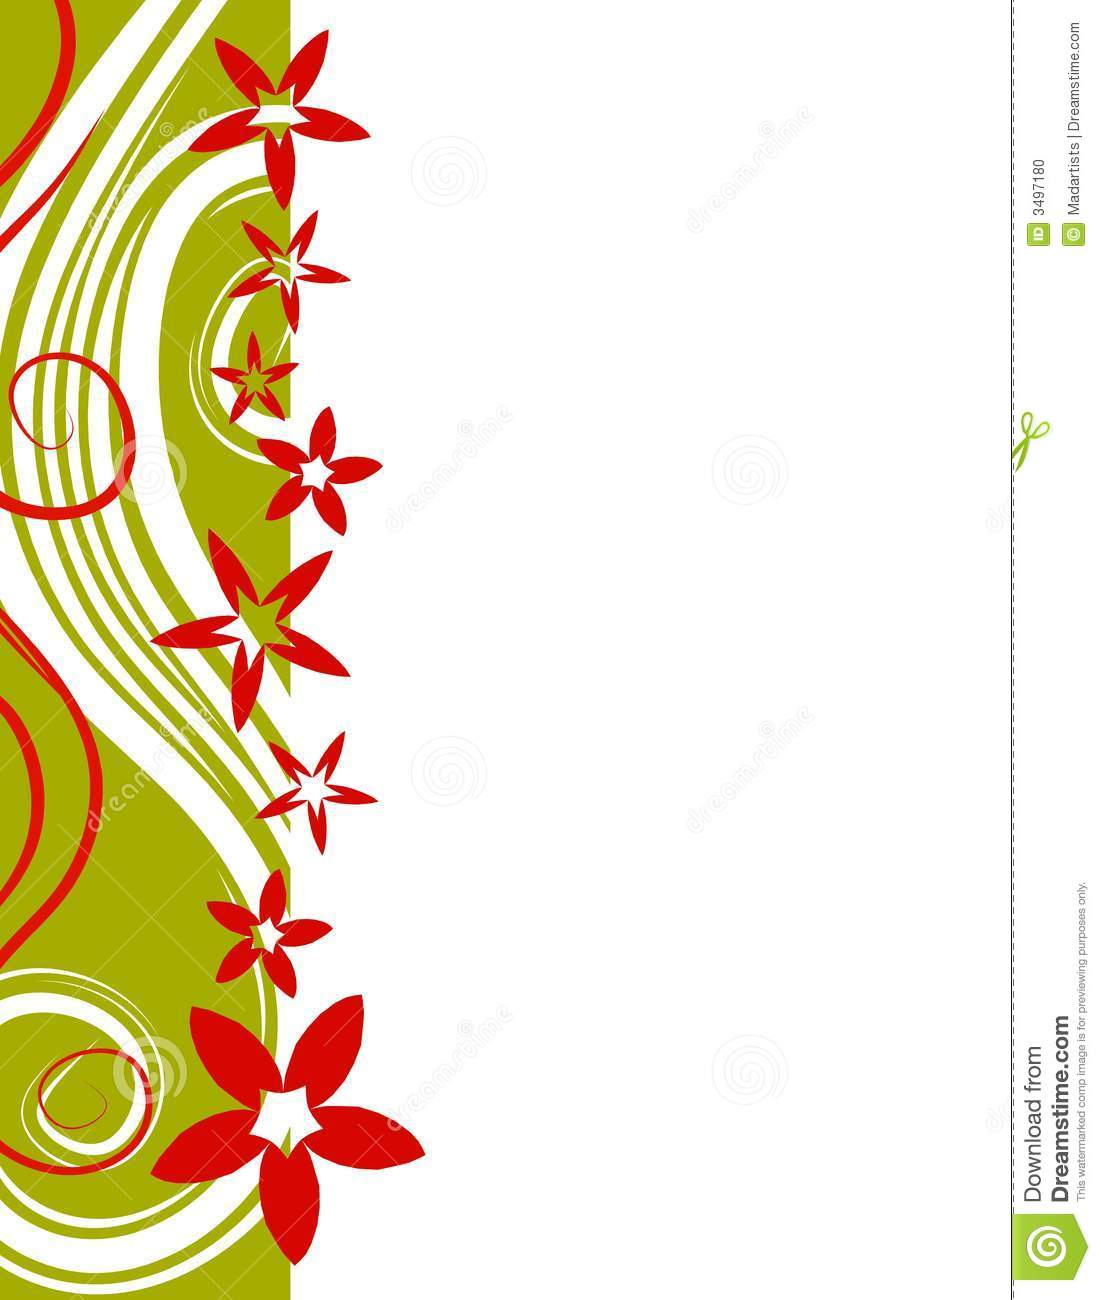 Poinsettia clipart horizontal flower border Border Clipart Free Clip free%20vintage%20christmas%20clip%20art